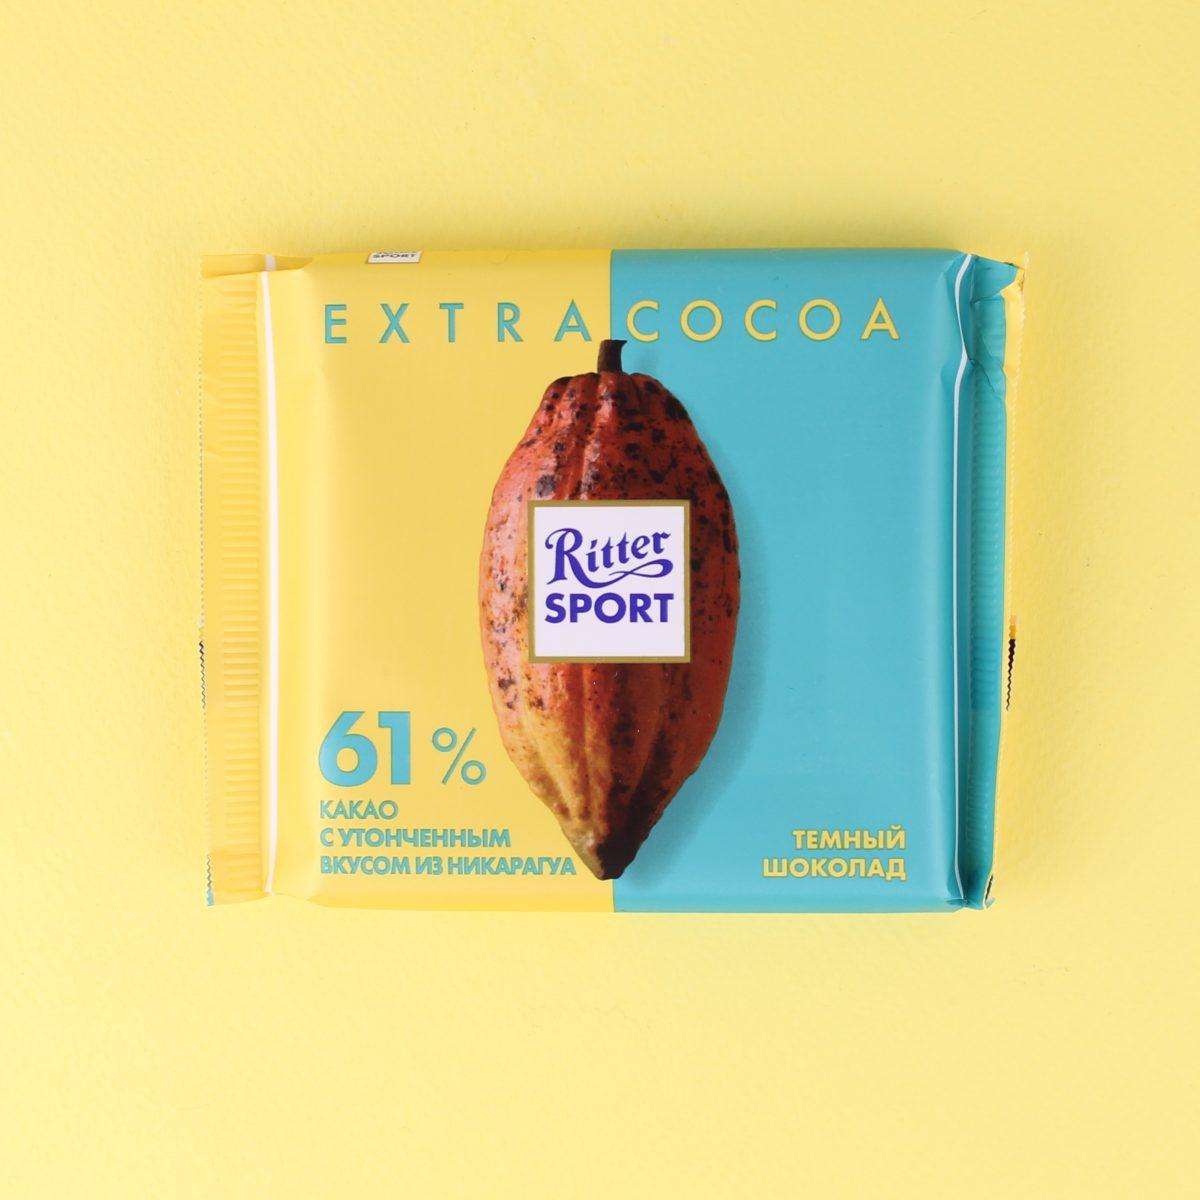 Шоколад 61% утончённый